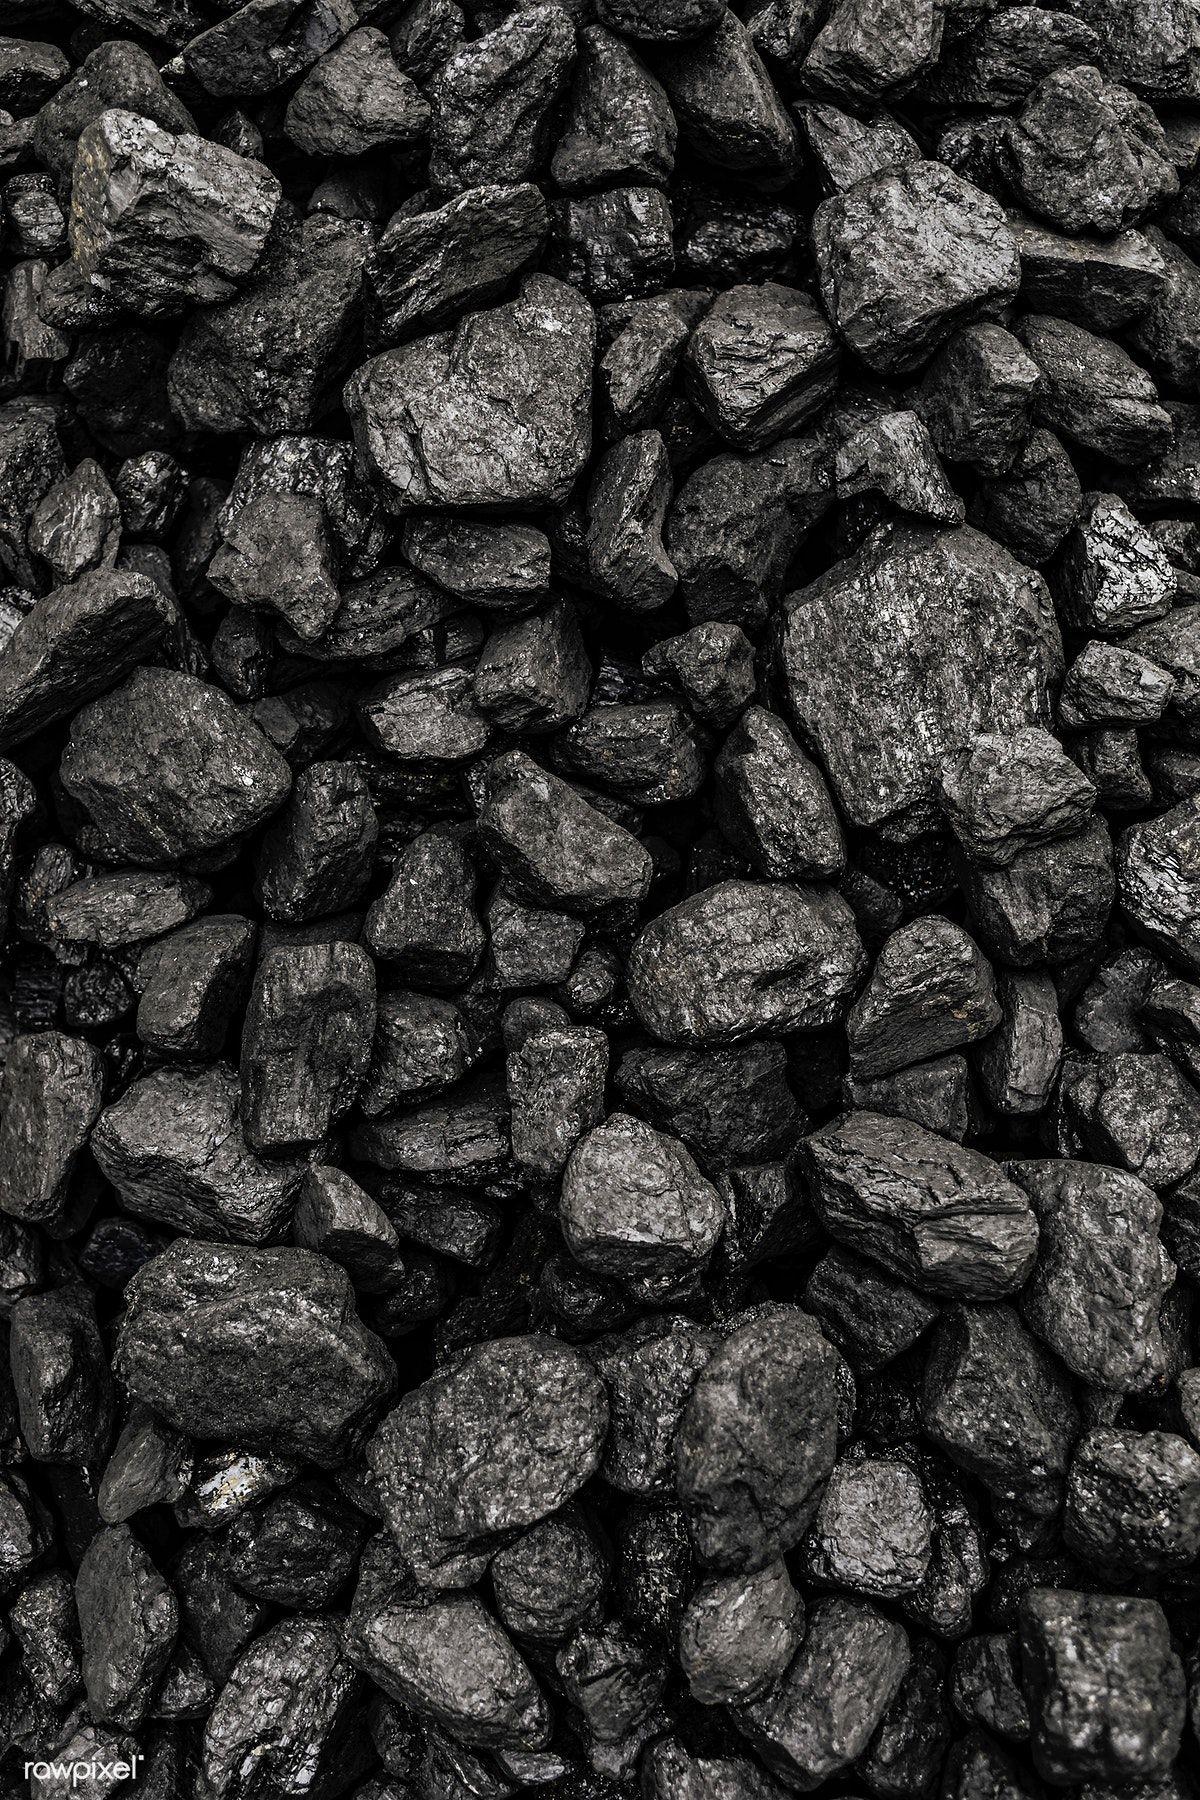 Download premium photo of Black pebbles macro shot